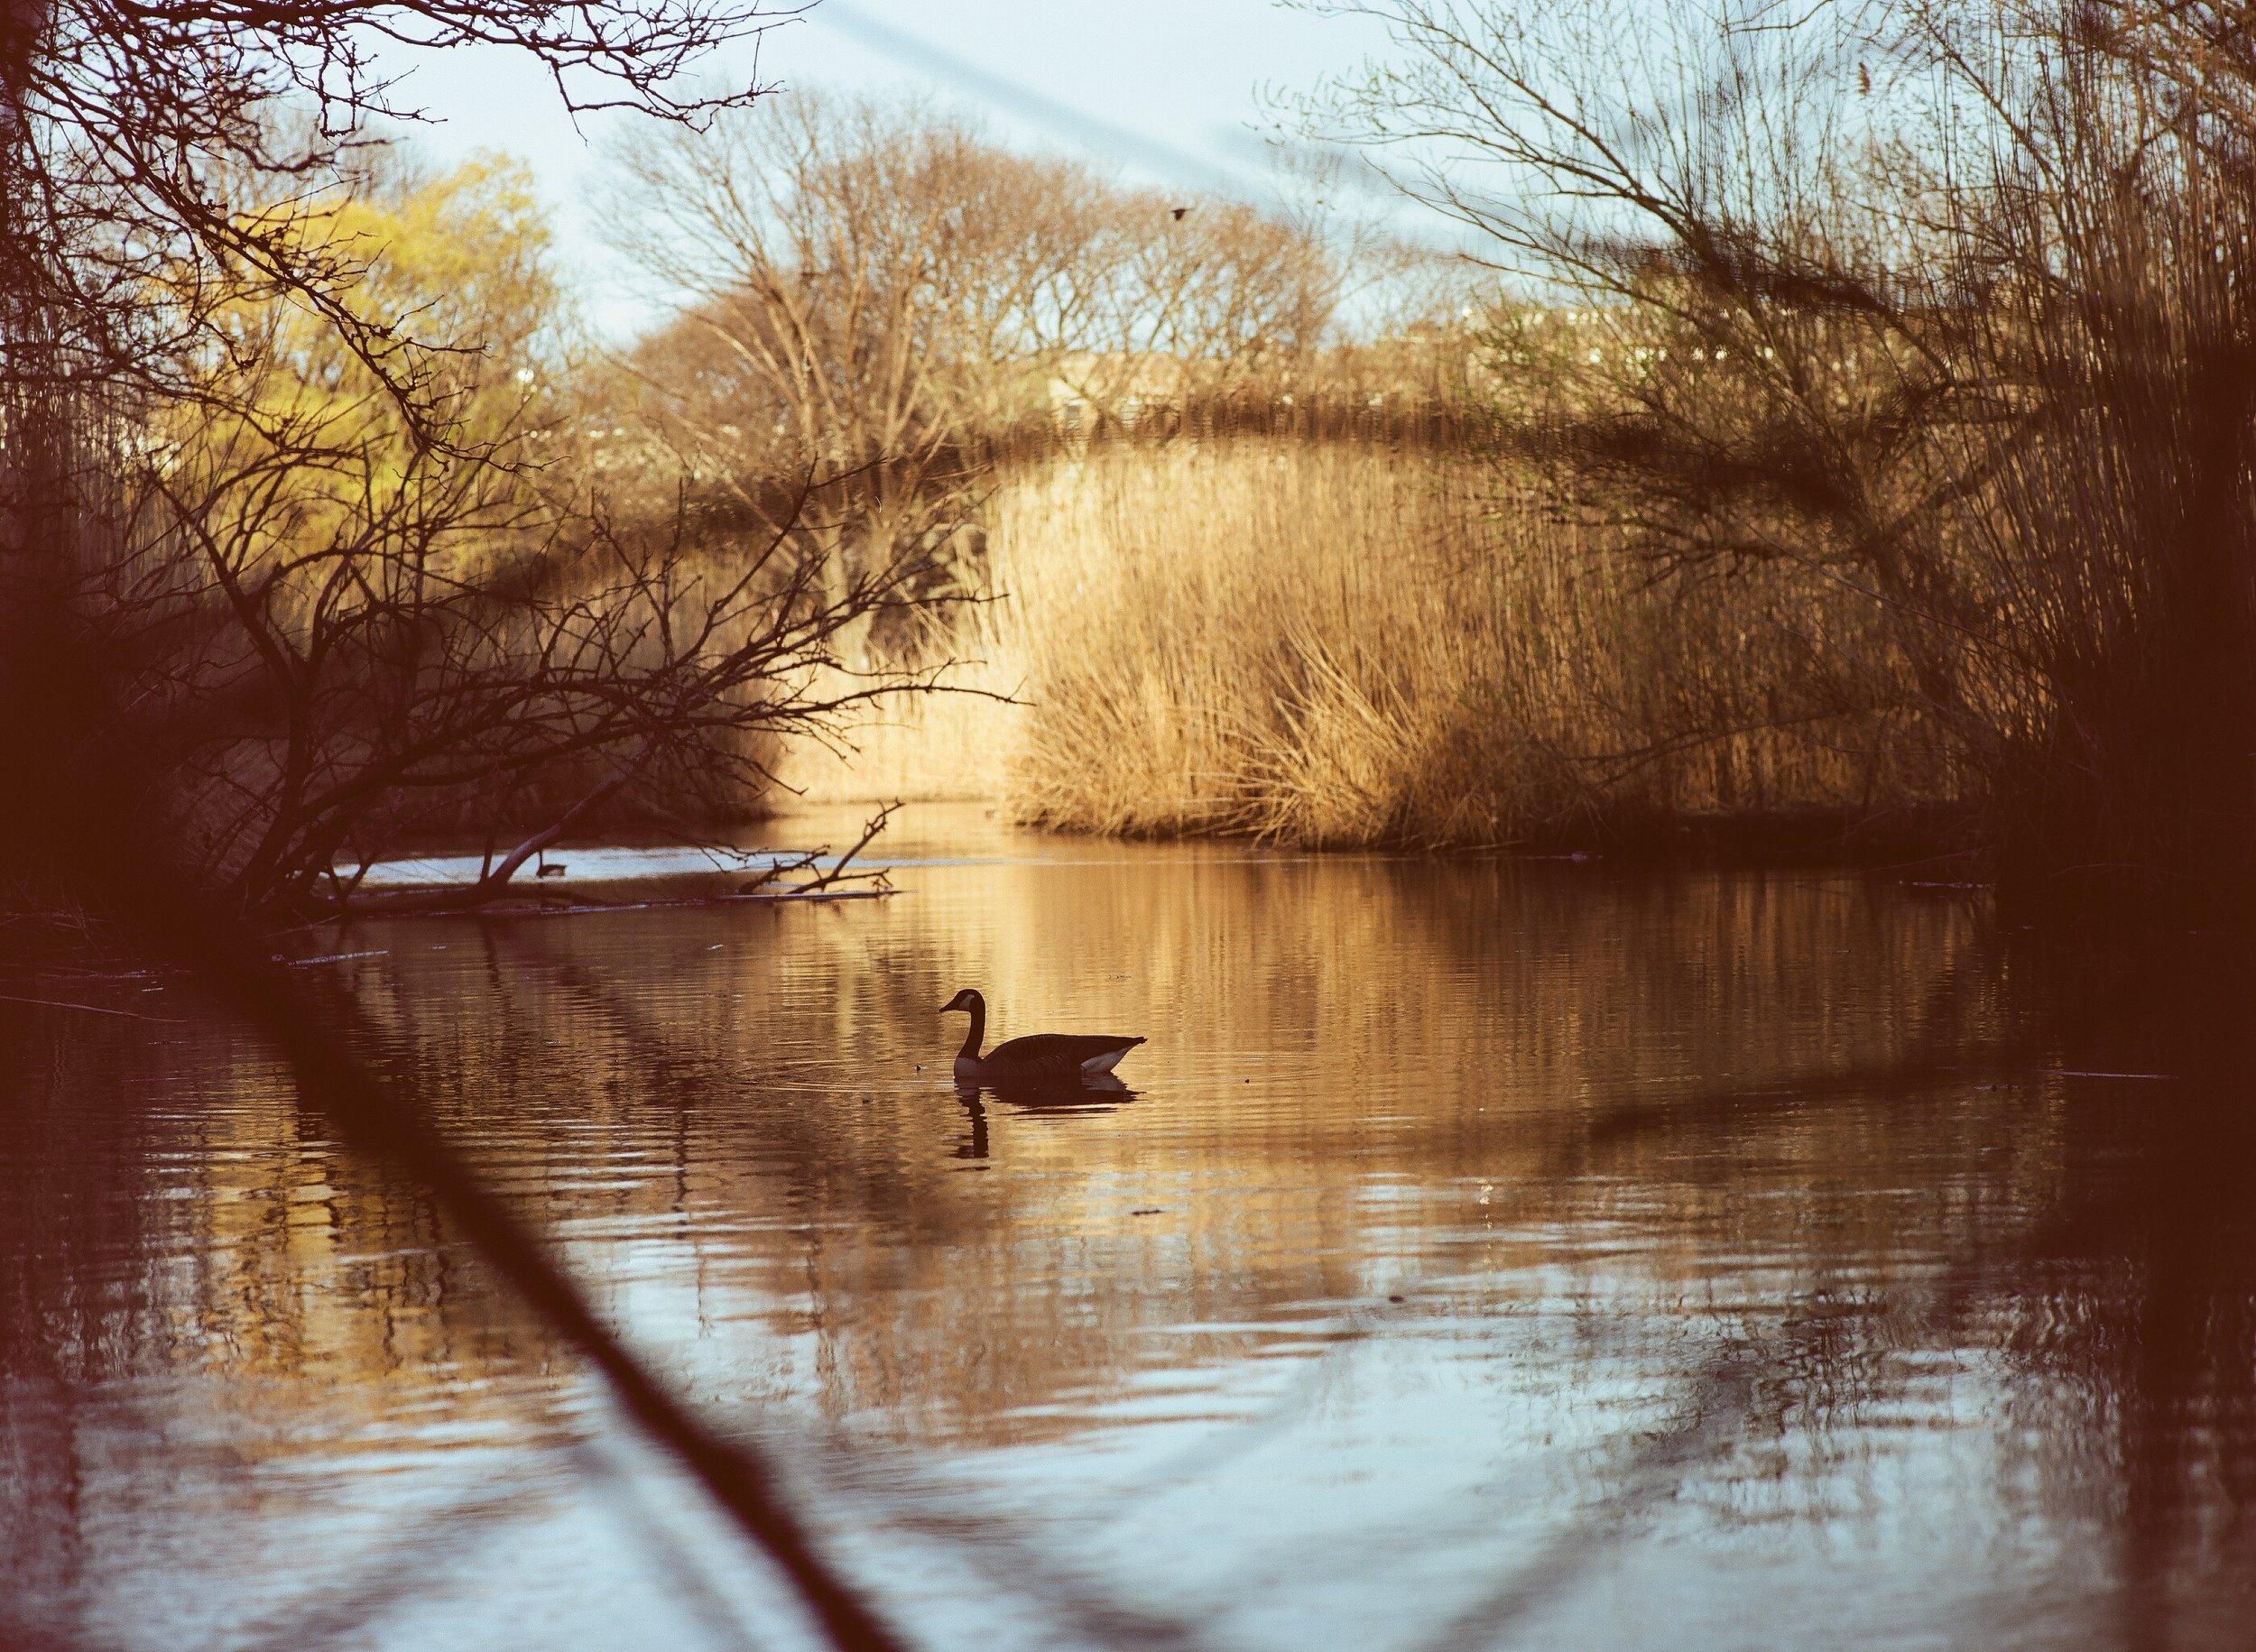 Shot on Kodak Portra 160